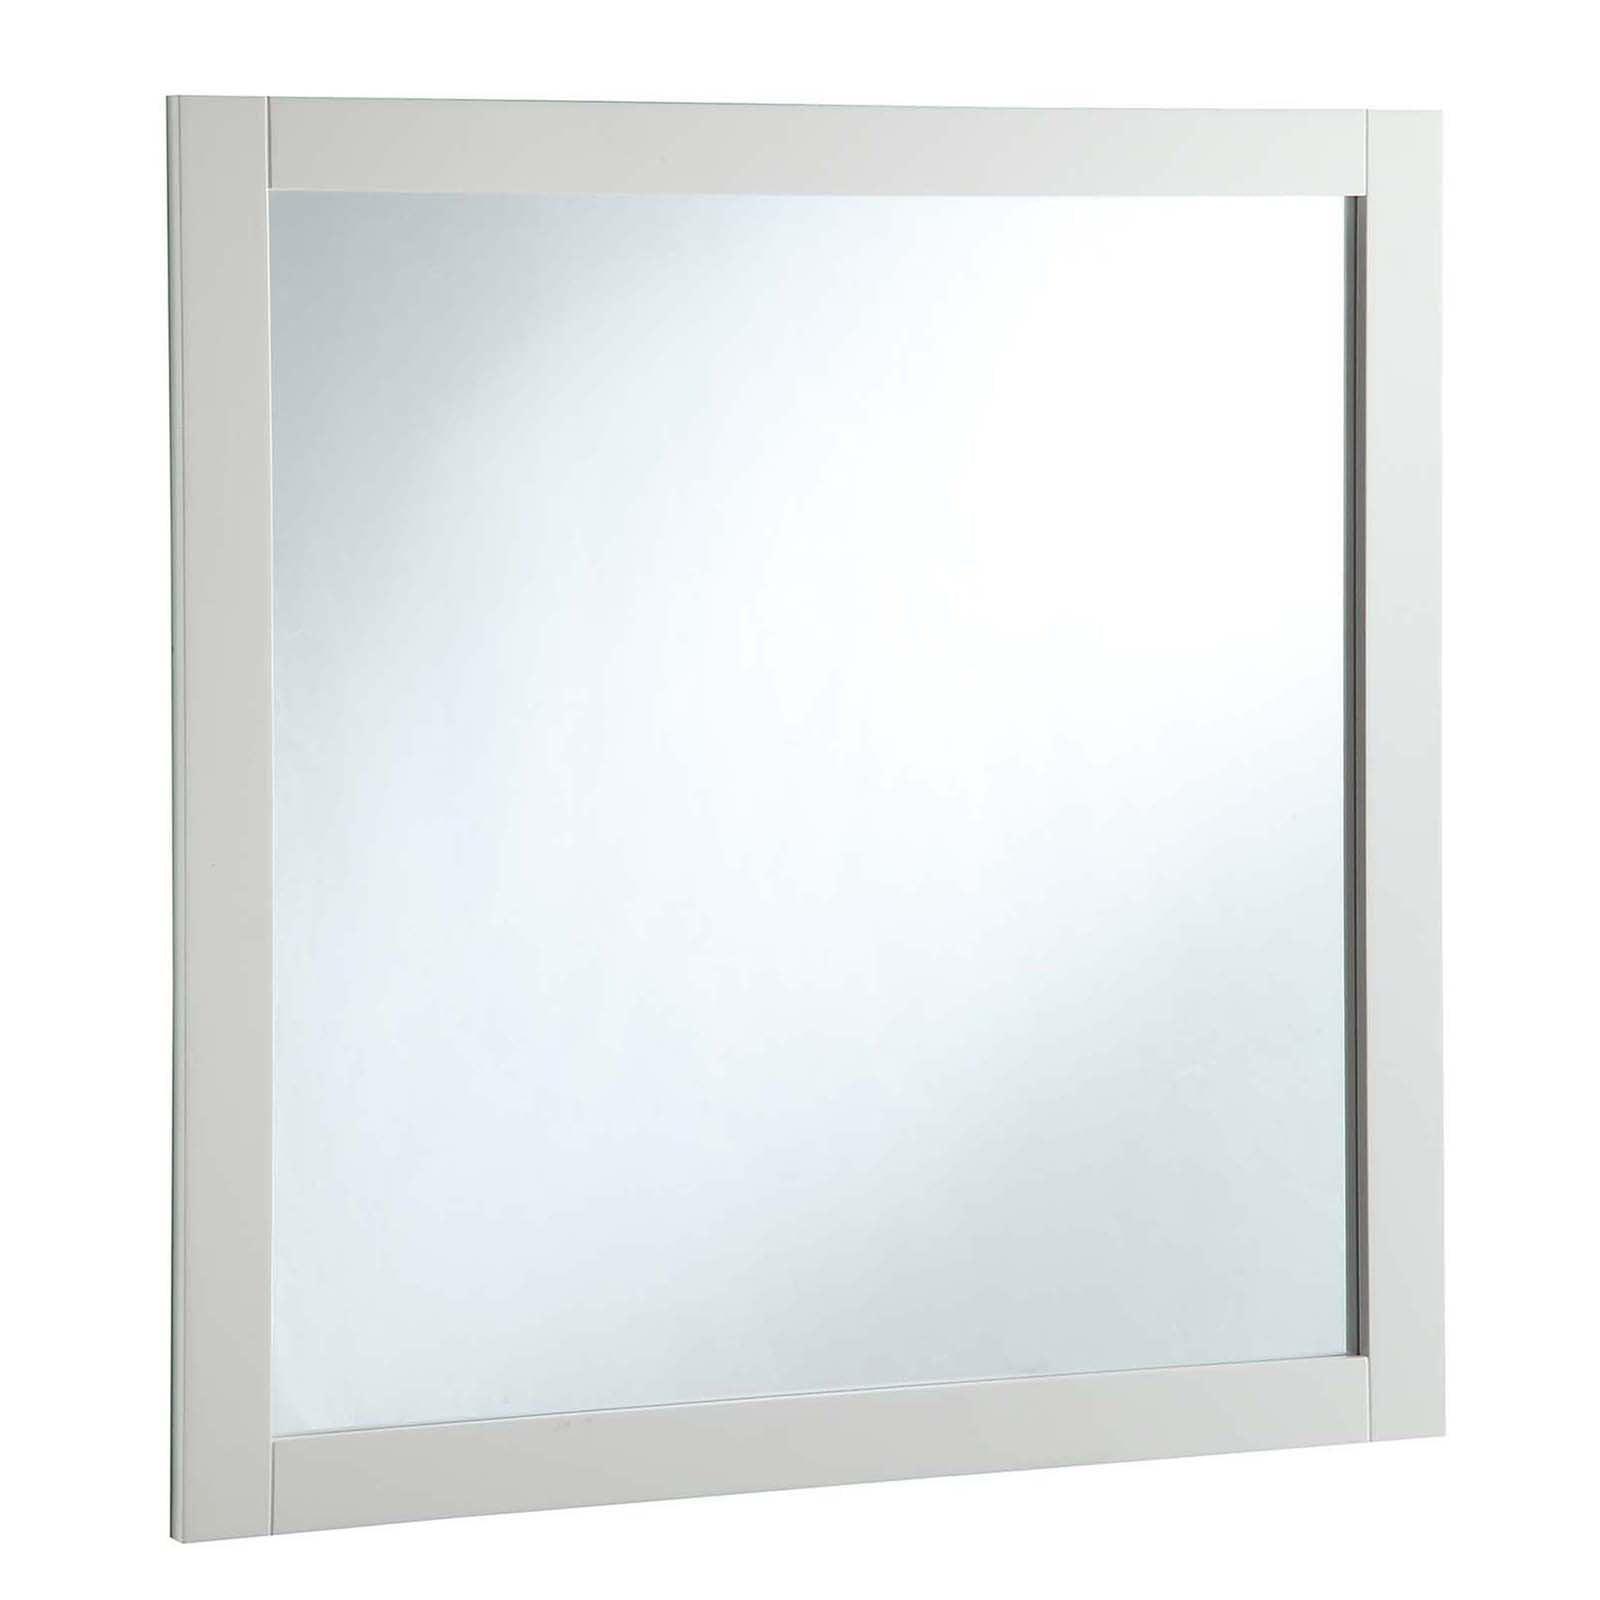 "Design House 547224 30"" x 30"" Vanity Mirror, Semi-Gloss White by Design House"